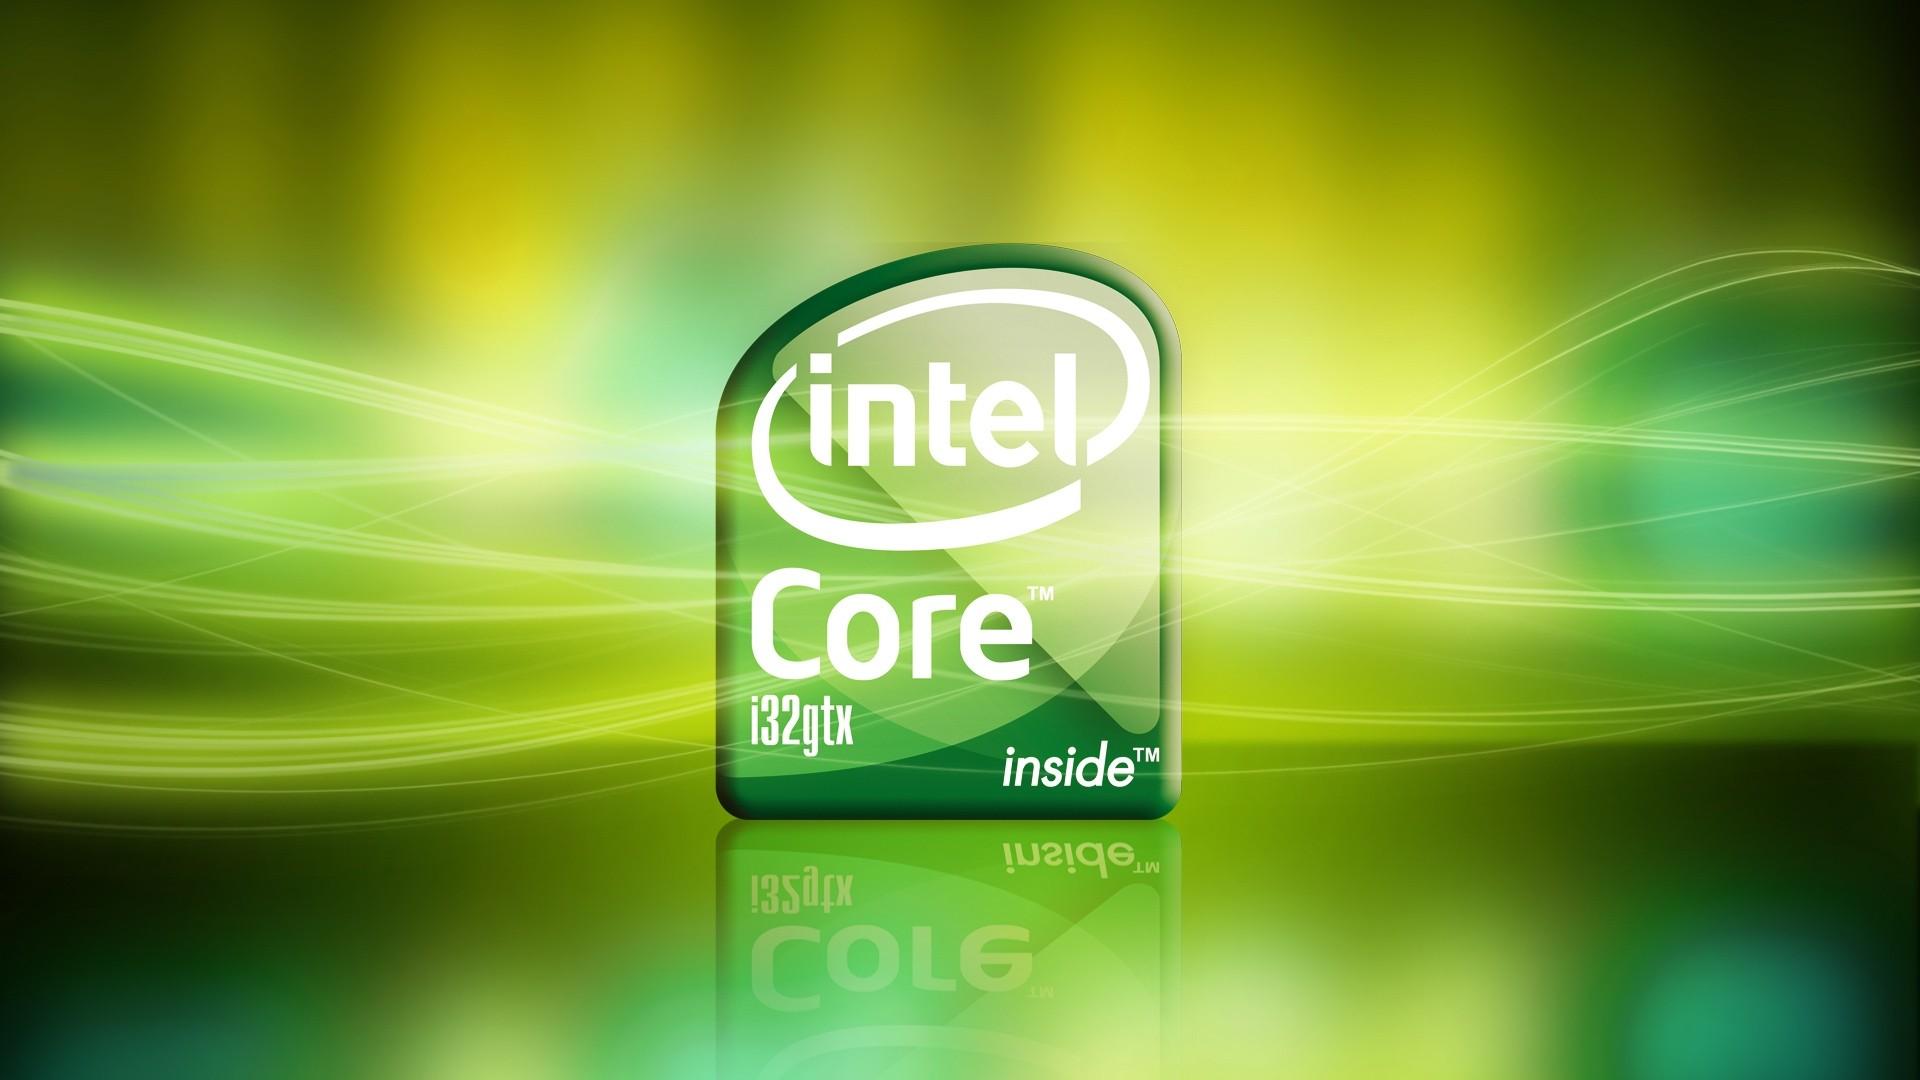 Intel Wallpaper Free